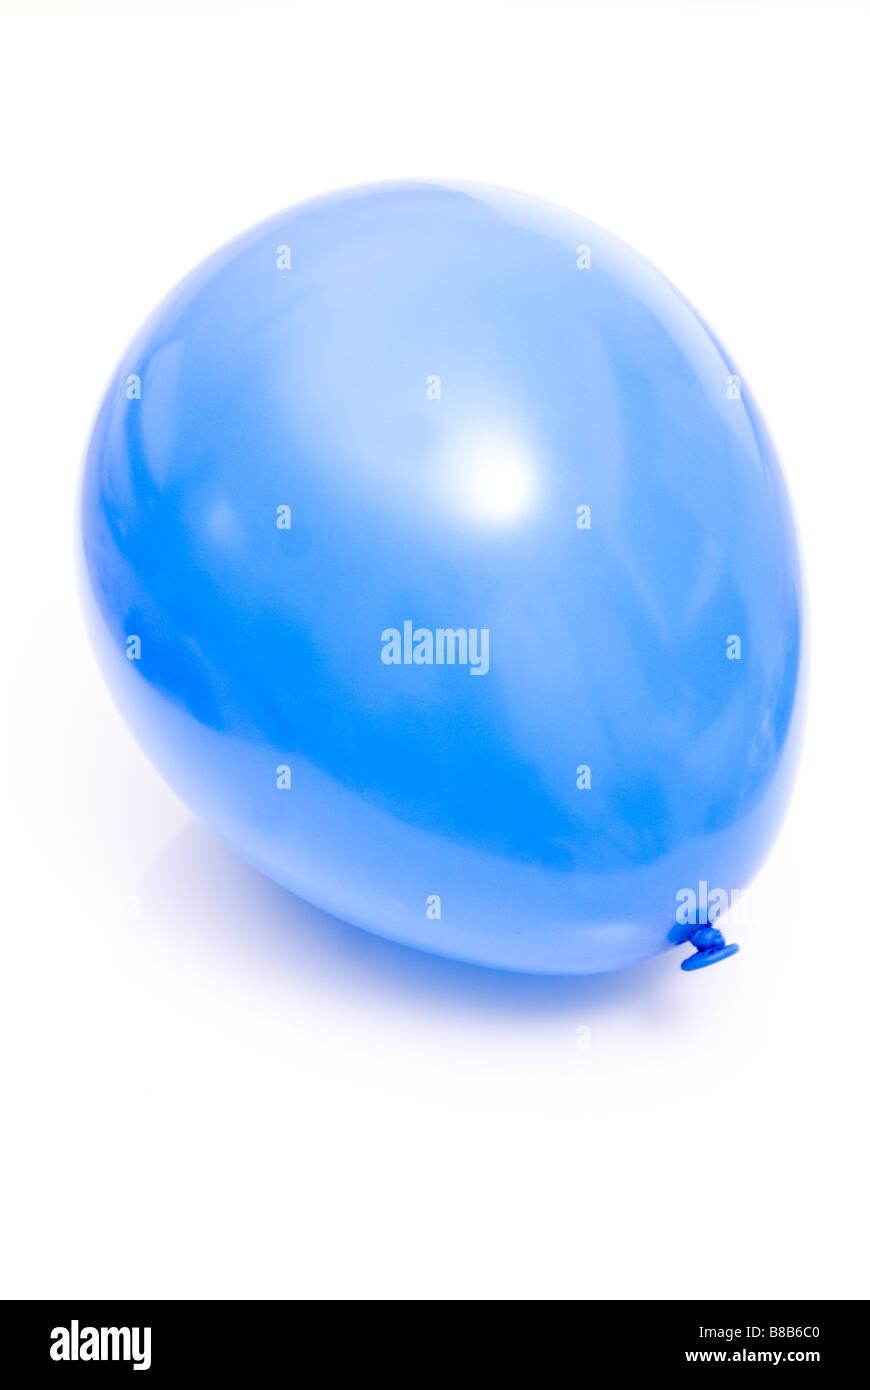 Un recorte de globo azul sobre un fondo blanco. Imagen De Stock